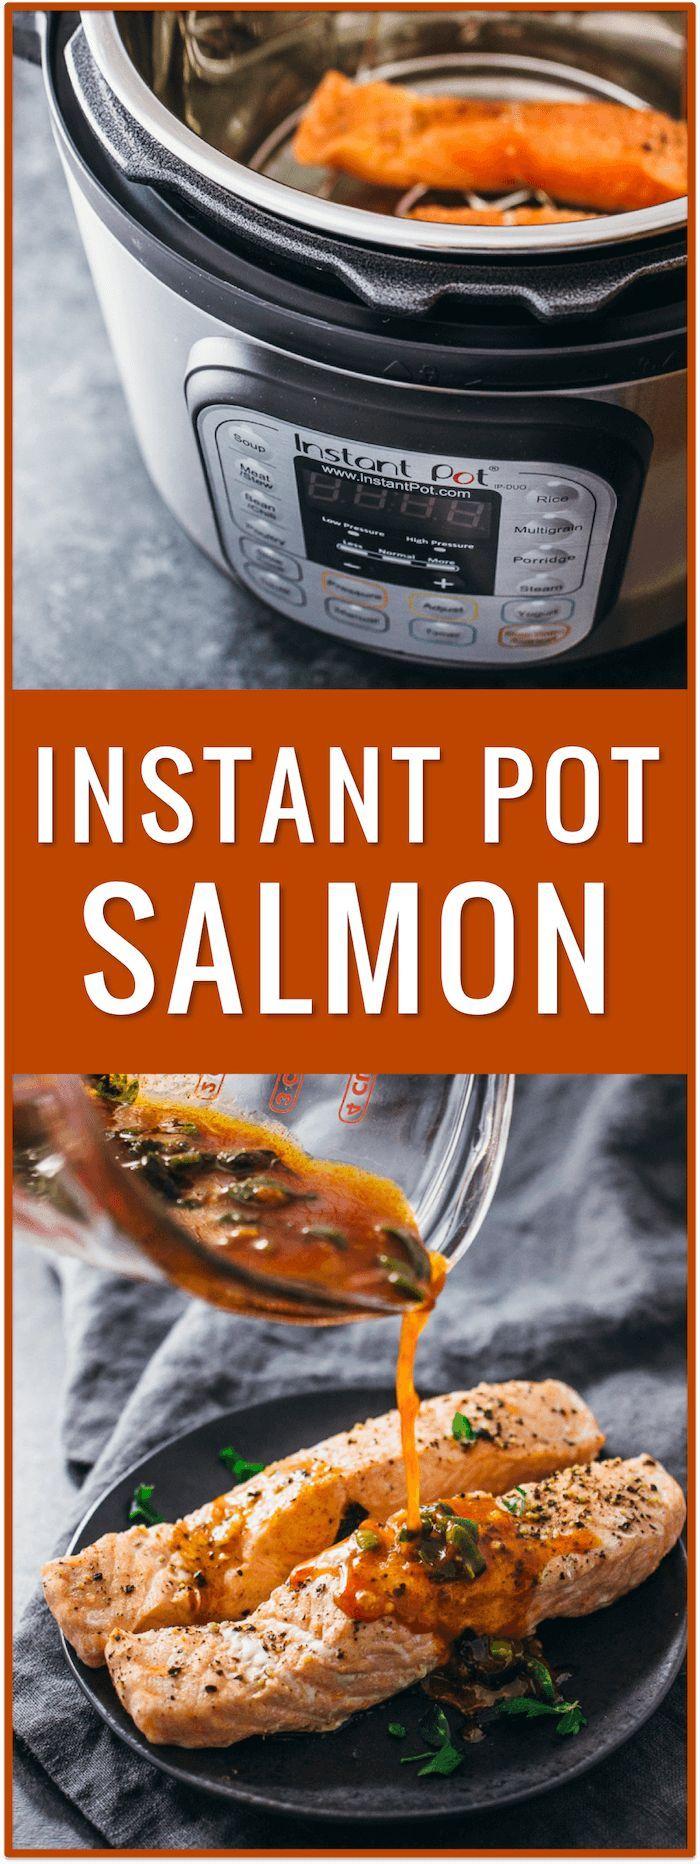 94 best community instant pot recipes images on pinterest for Instant pot fish recipes